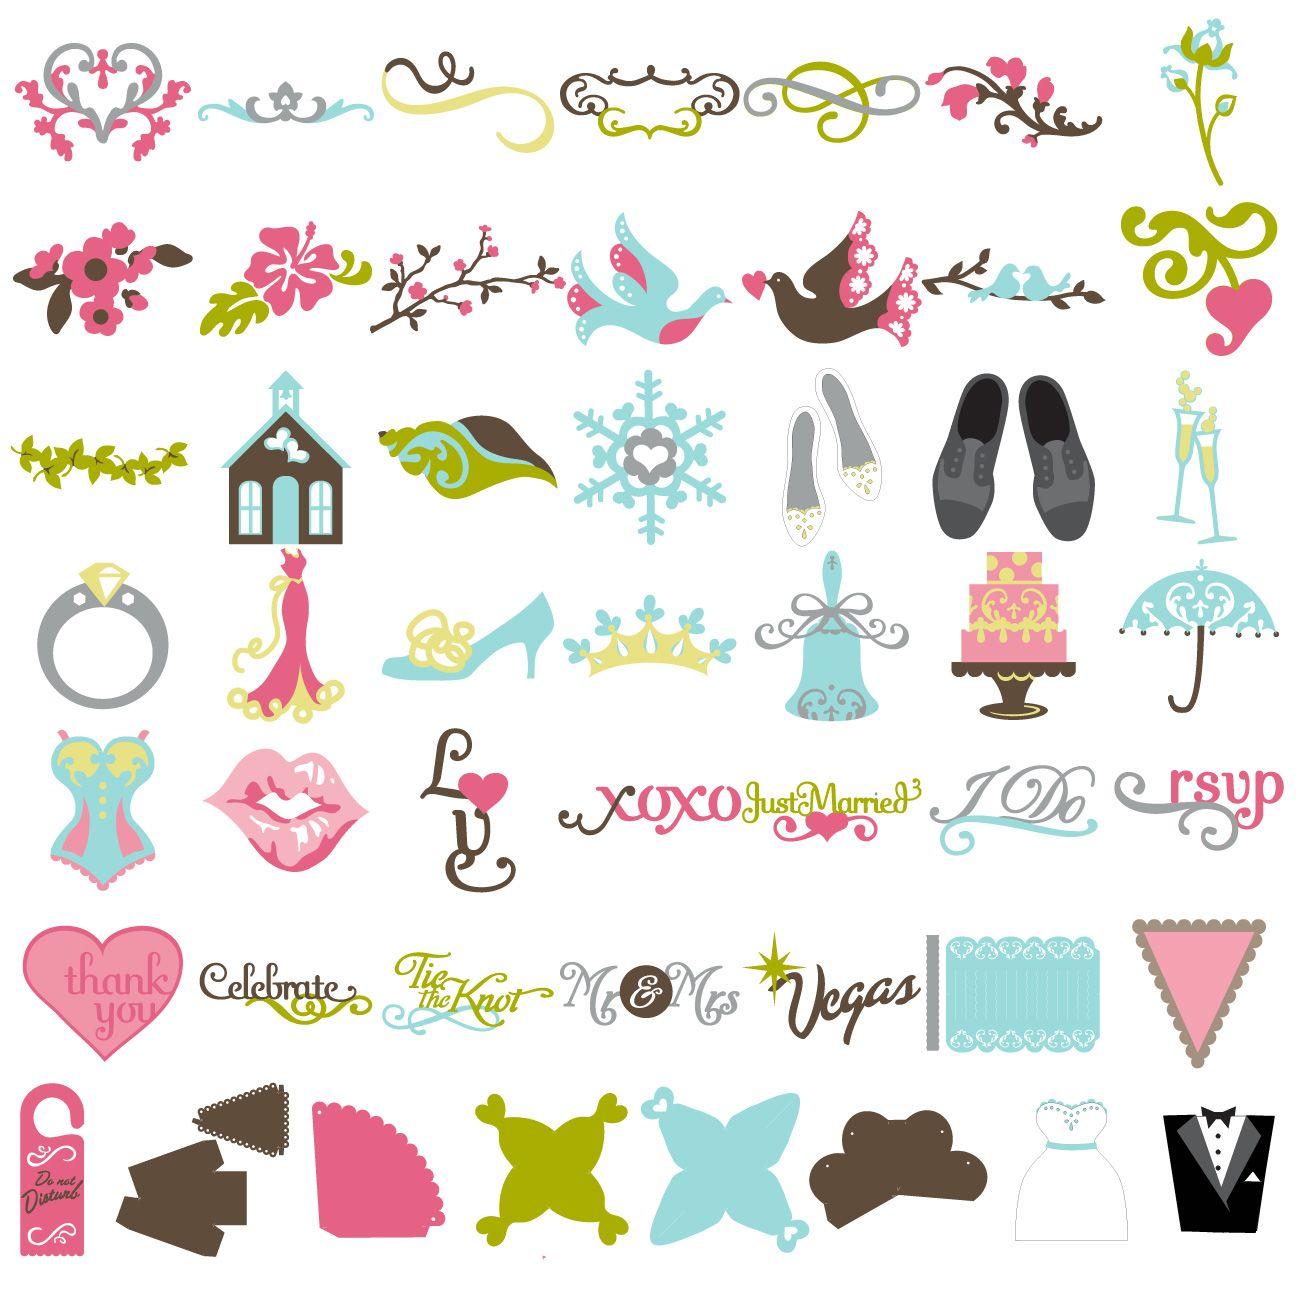 Tie the Knot Wedding scrapbook, Paper crafts, Crafts